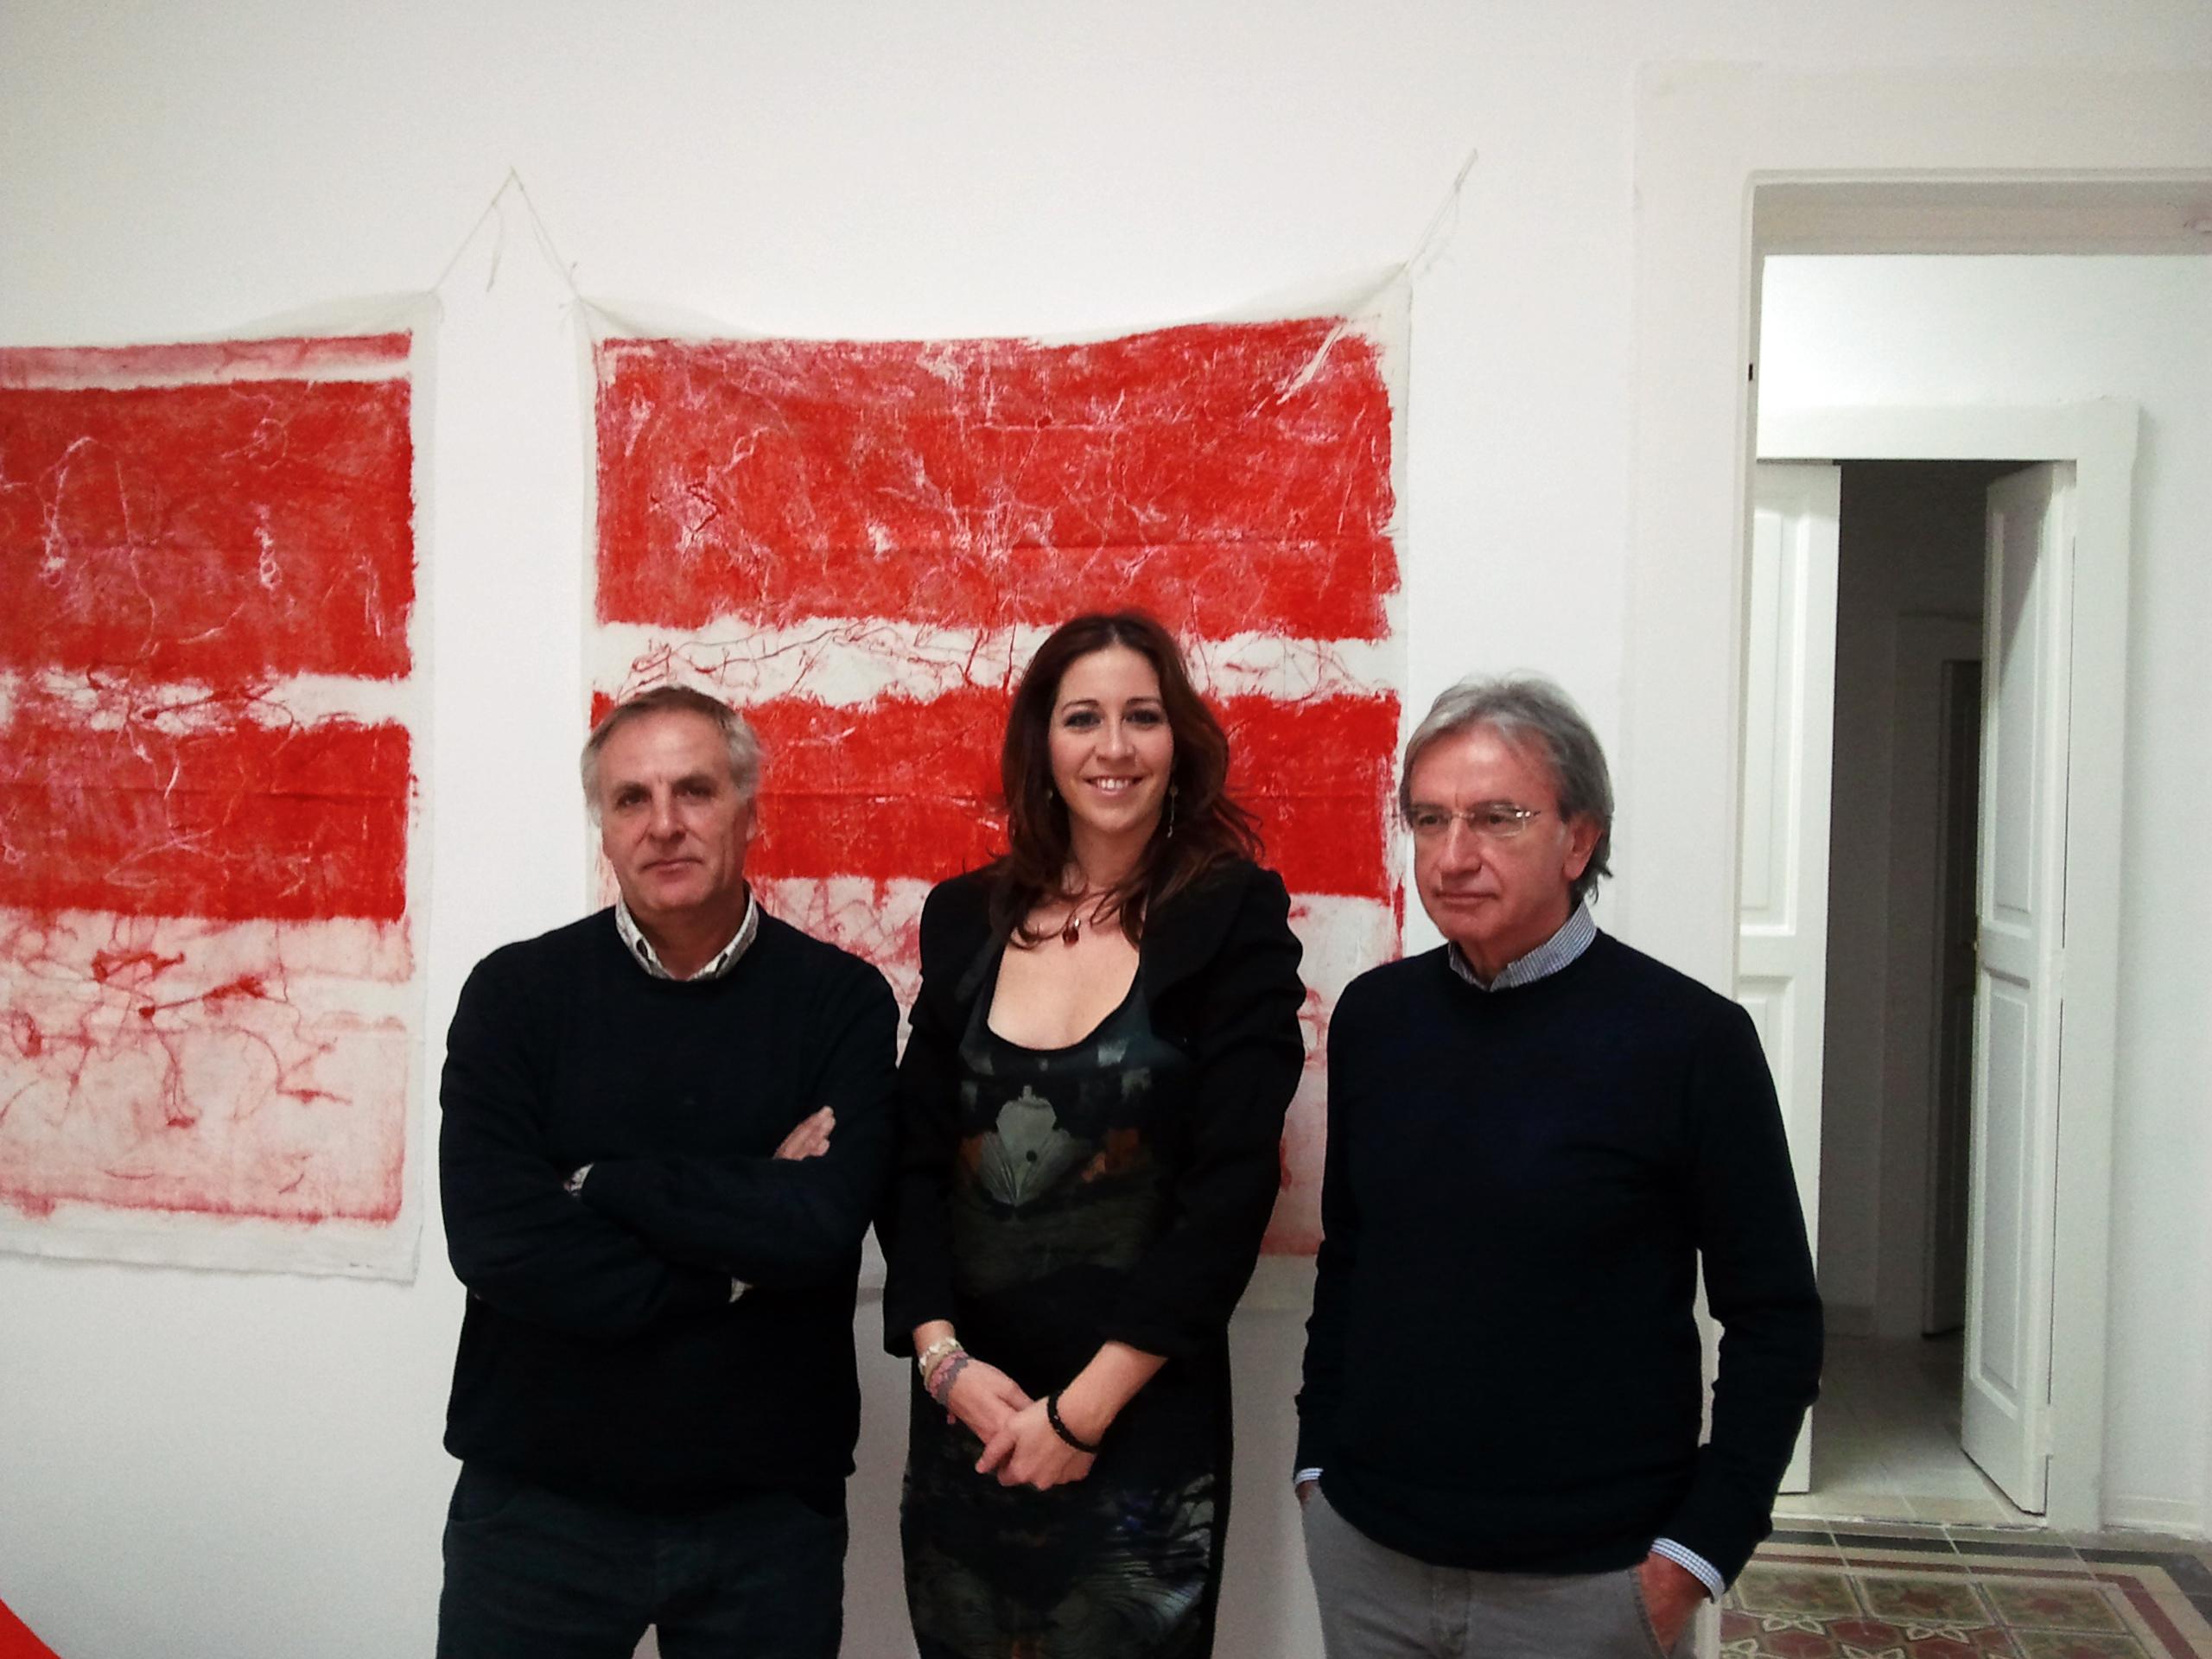 Artes campobasso, nicola dusi gobbetti, arte molise, mostre molise, musei molise, gallerie arte molise